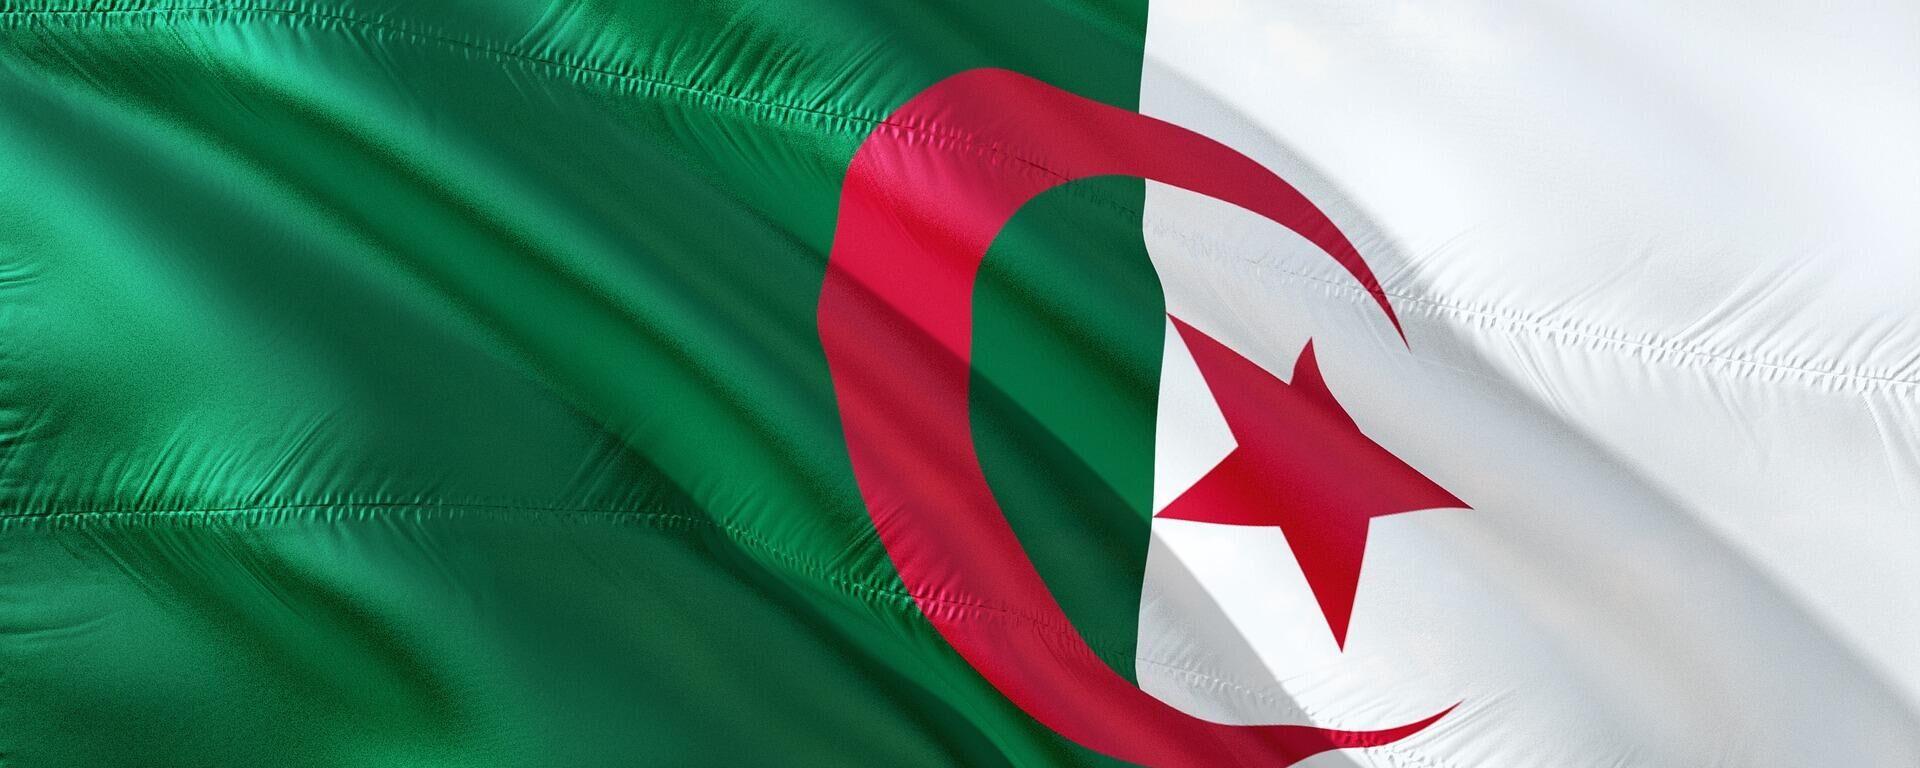 Bandera de Argelia - Sputnik Mundo, 1920, 03.10.2021